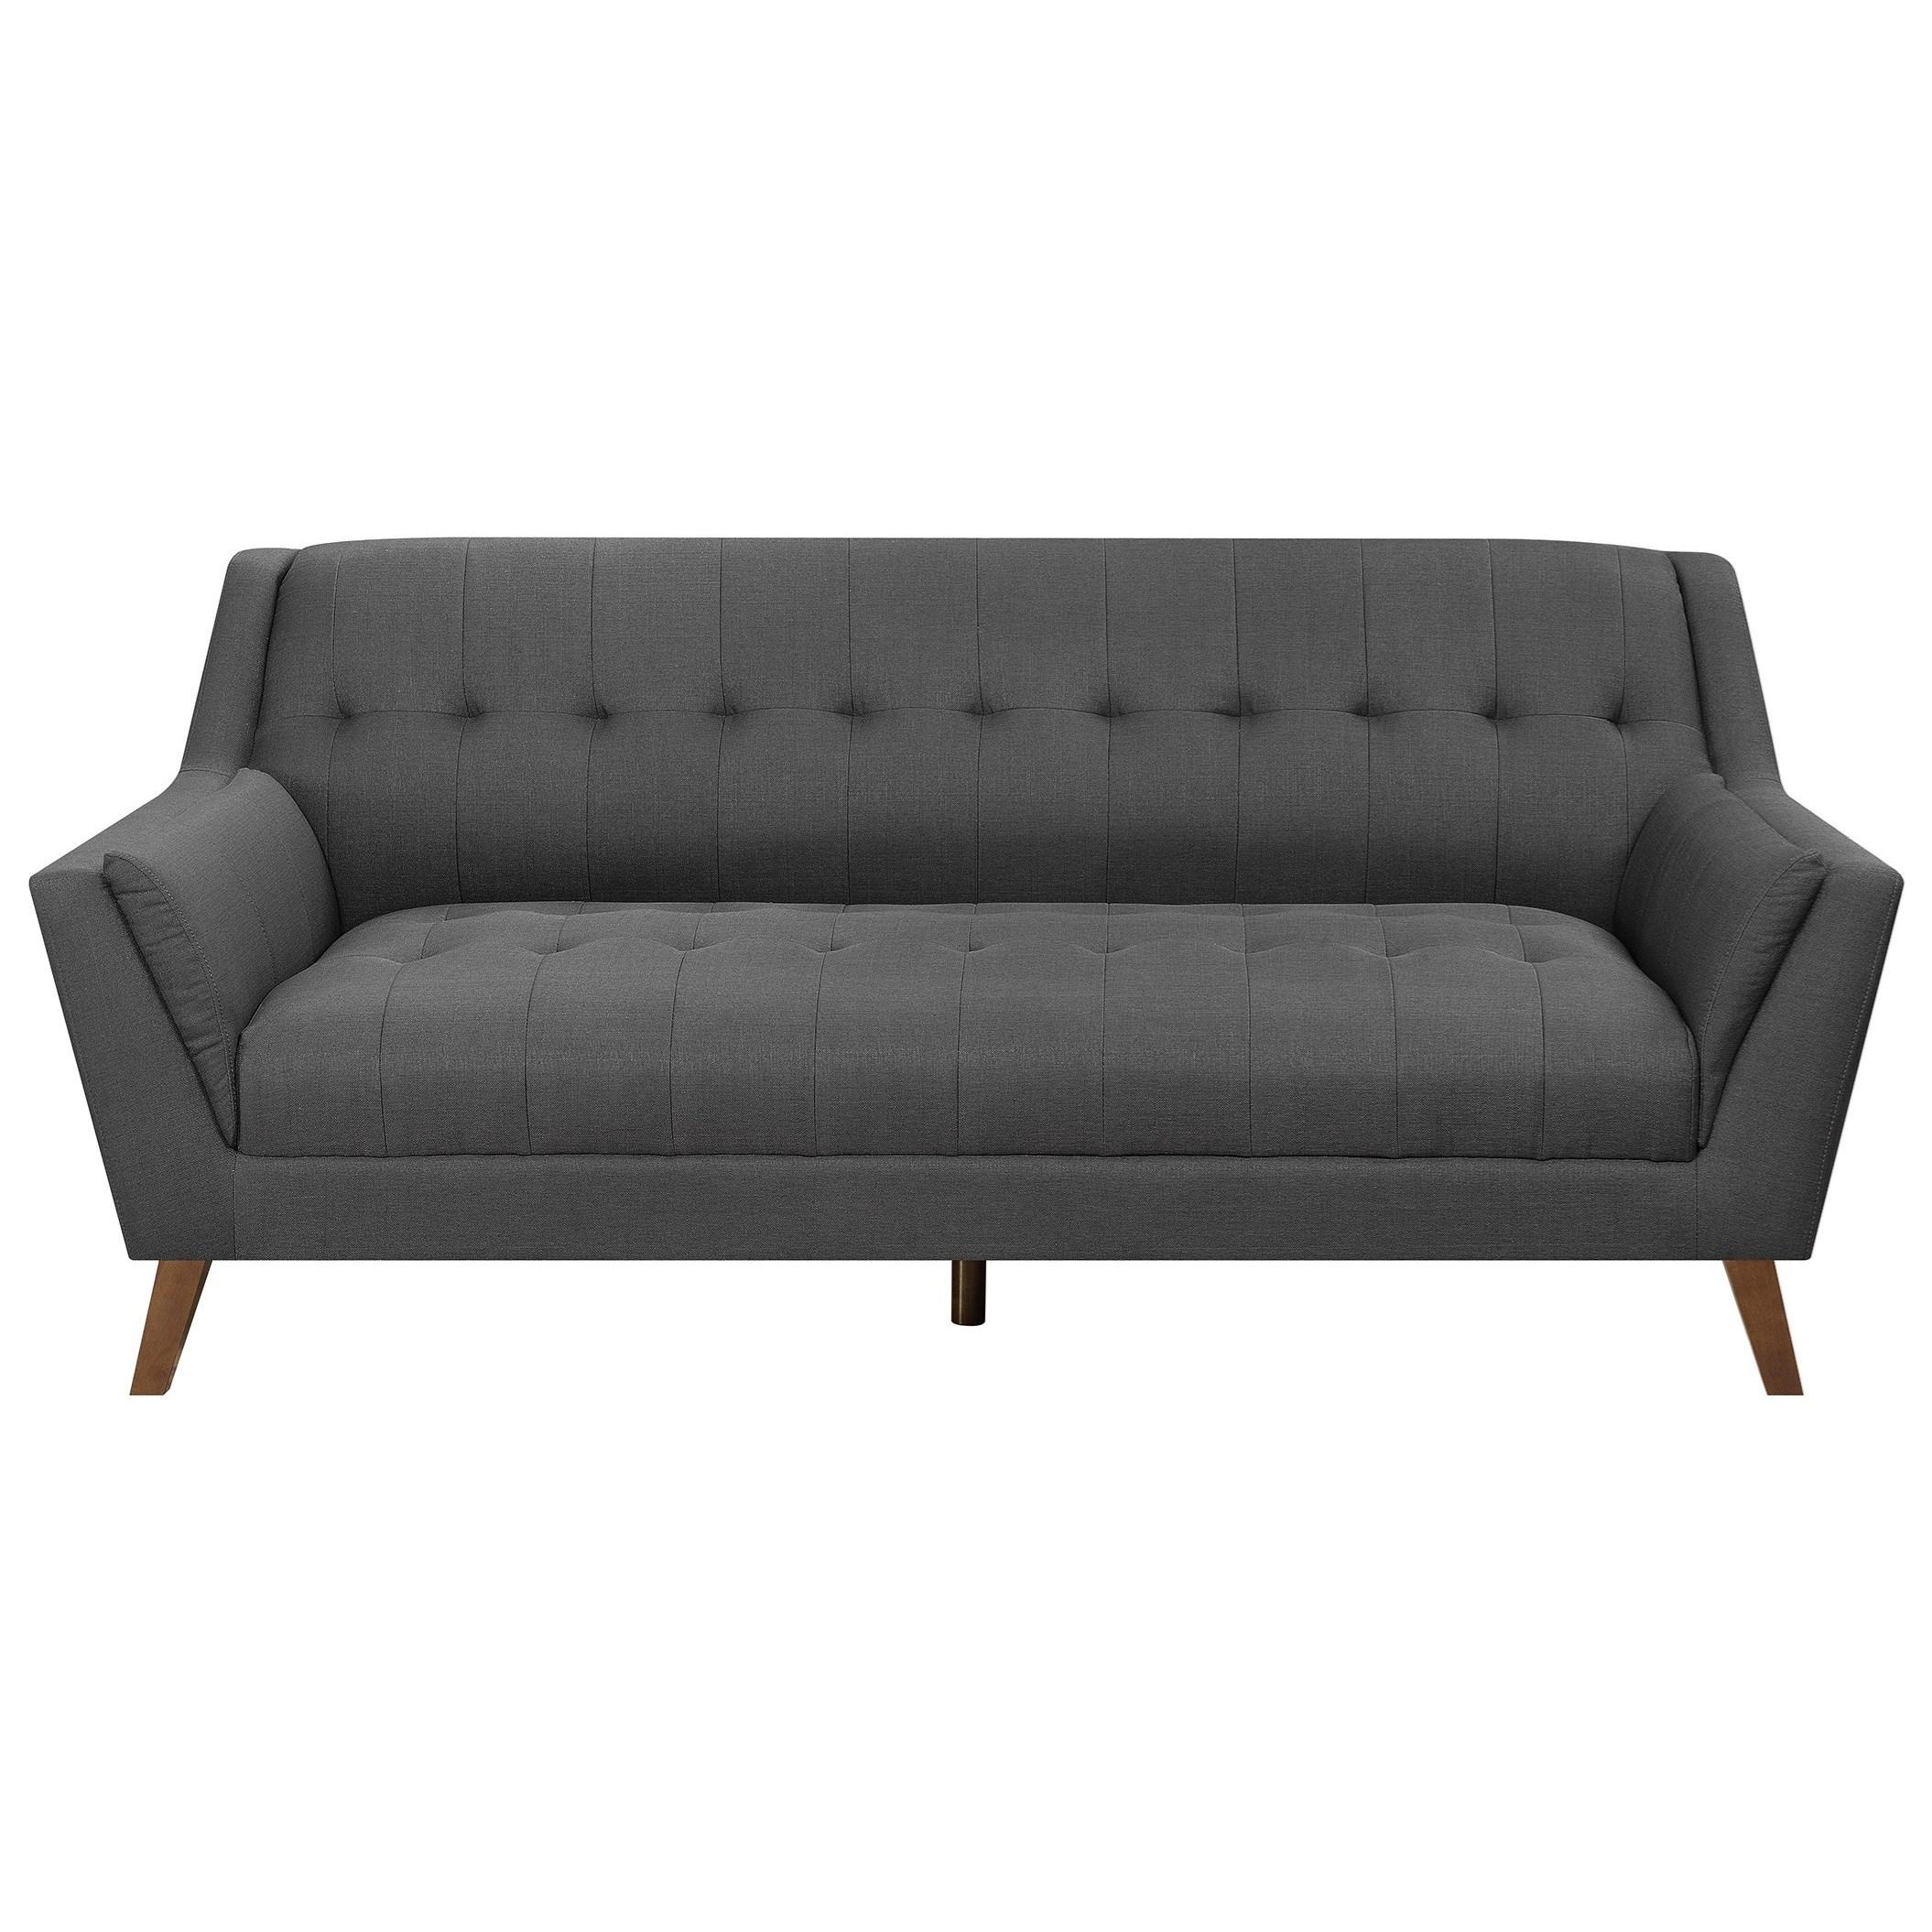 Binetti Sofa by Emerald at Miller Waldrop Furniture and Decor